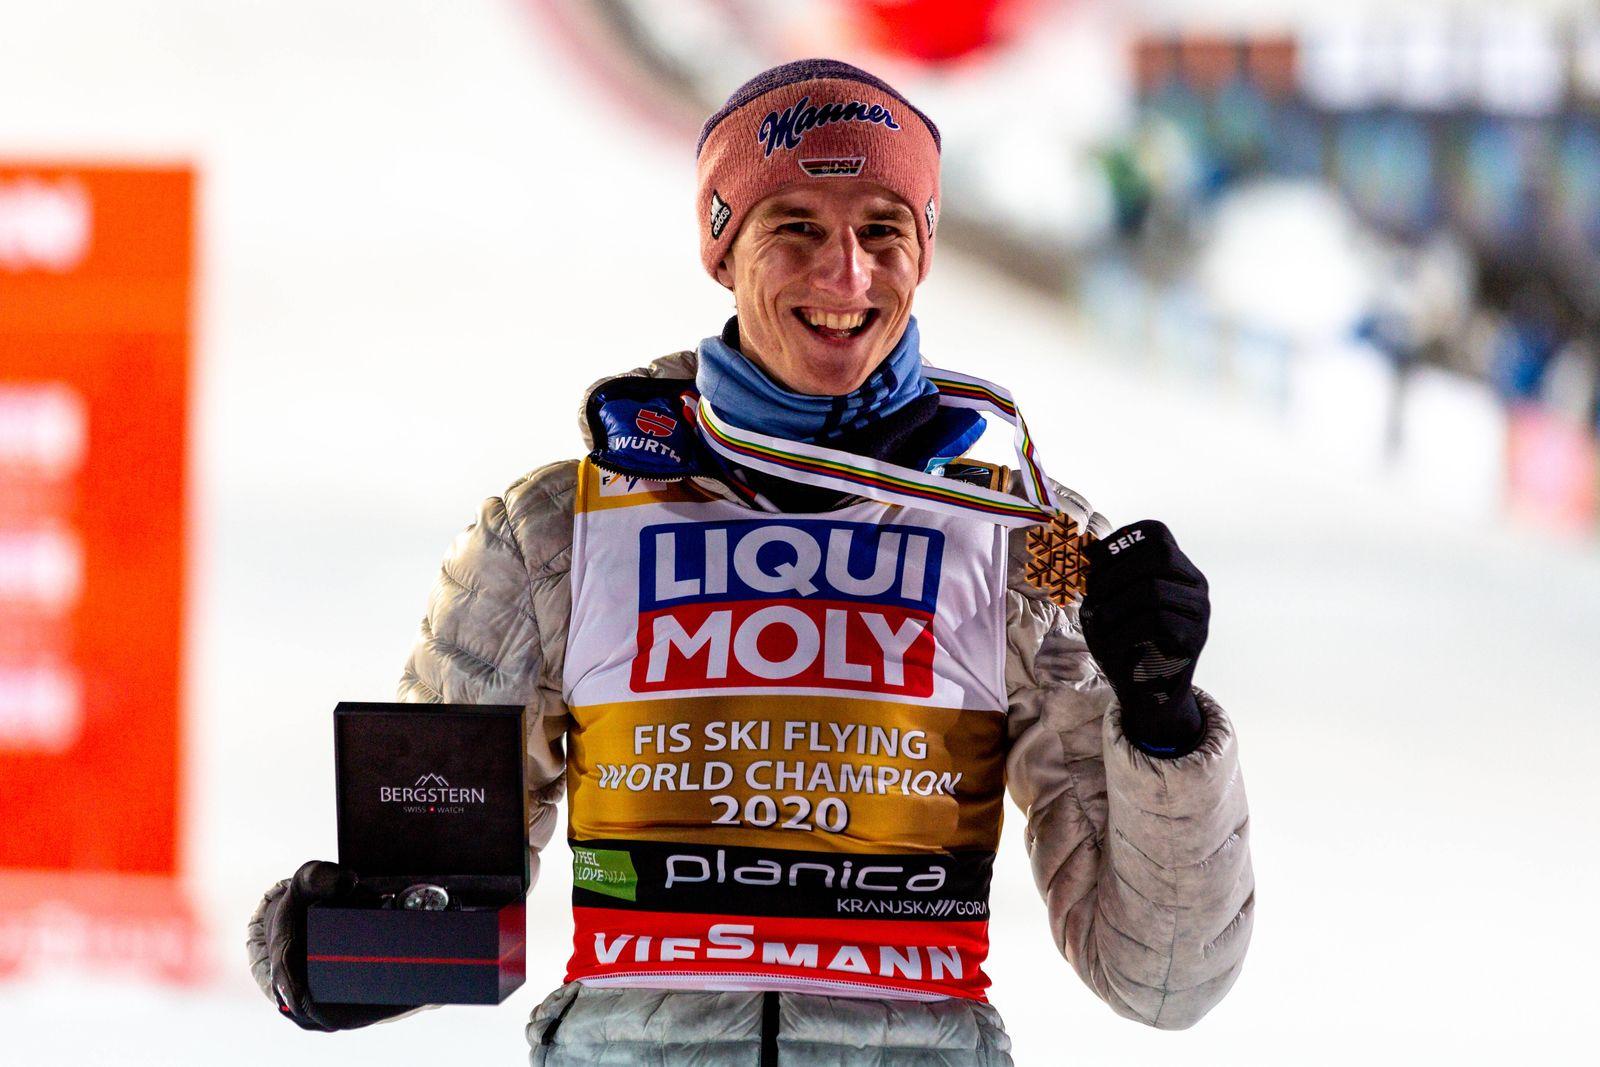 SKI FLYING - FIS Ski Flying World Championship, WM, Weltmeisterschaft Planica PLANICA,SLOVENIA,12.DEC.20 - NORDIC SKIIN